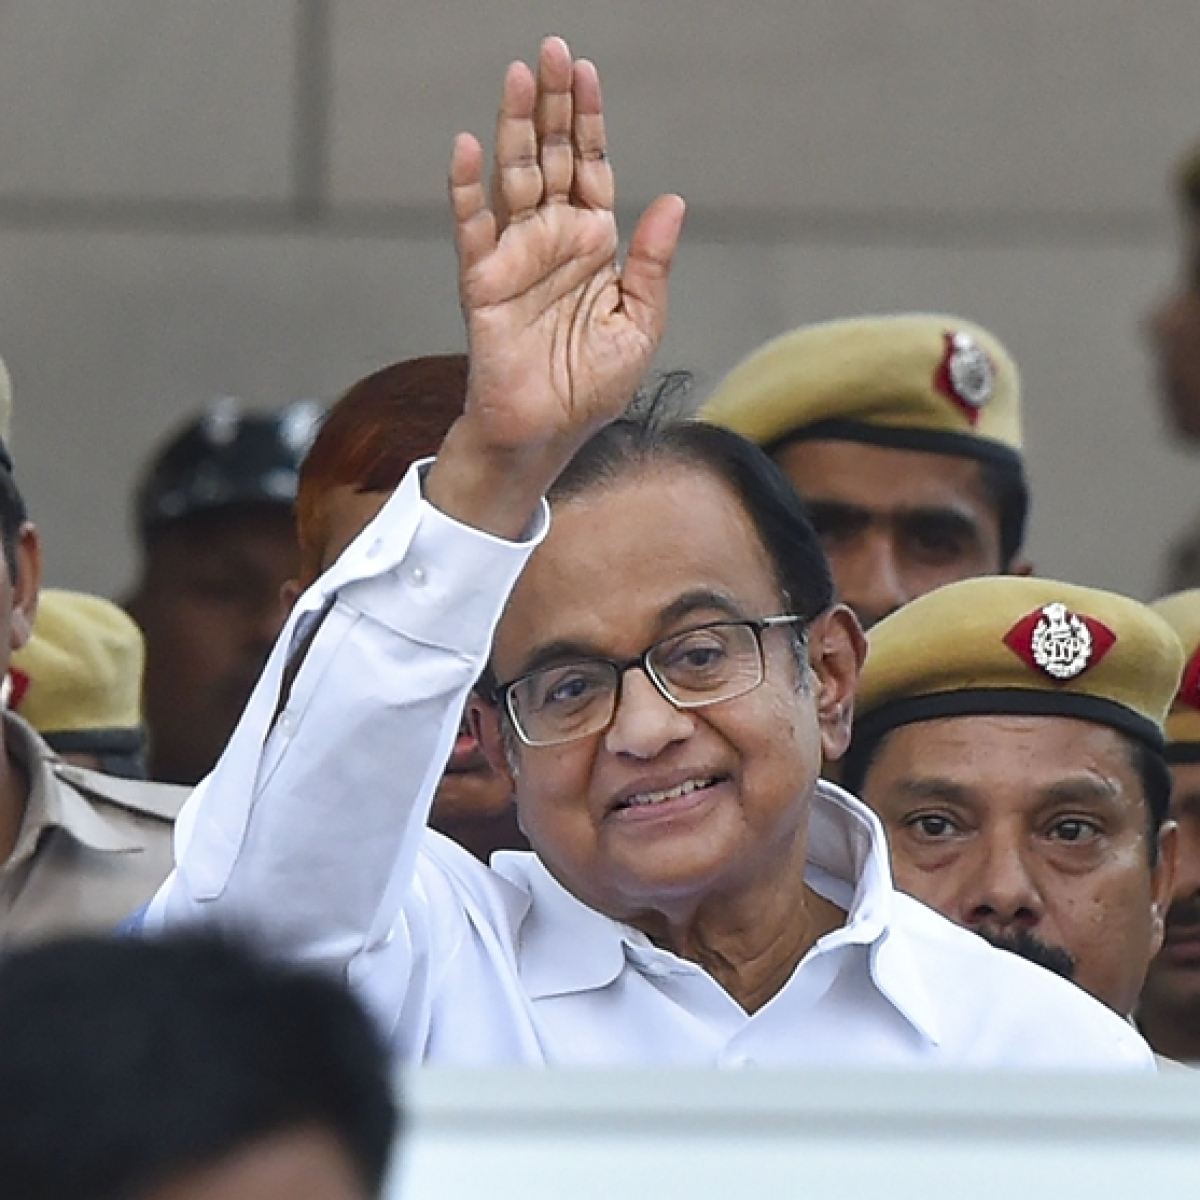 After 106 days in Tihar jail, P Chidambaram finally walks out